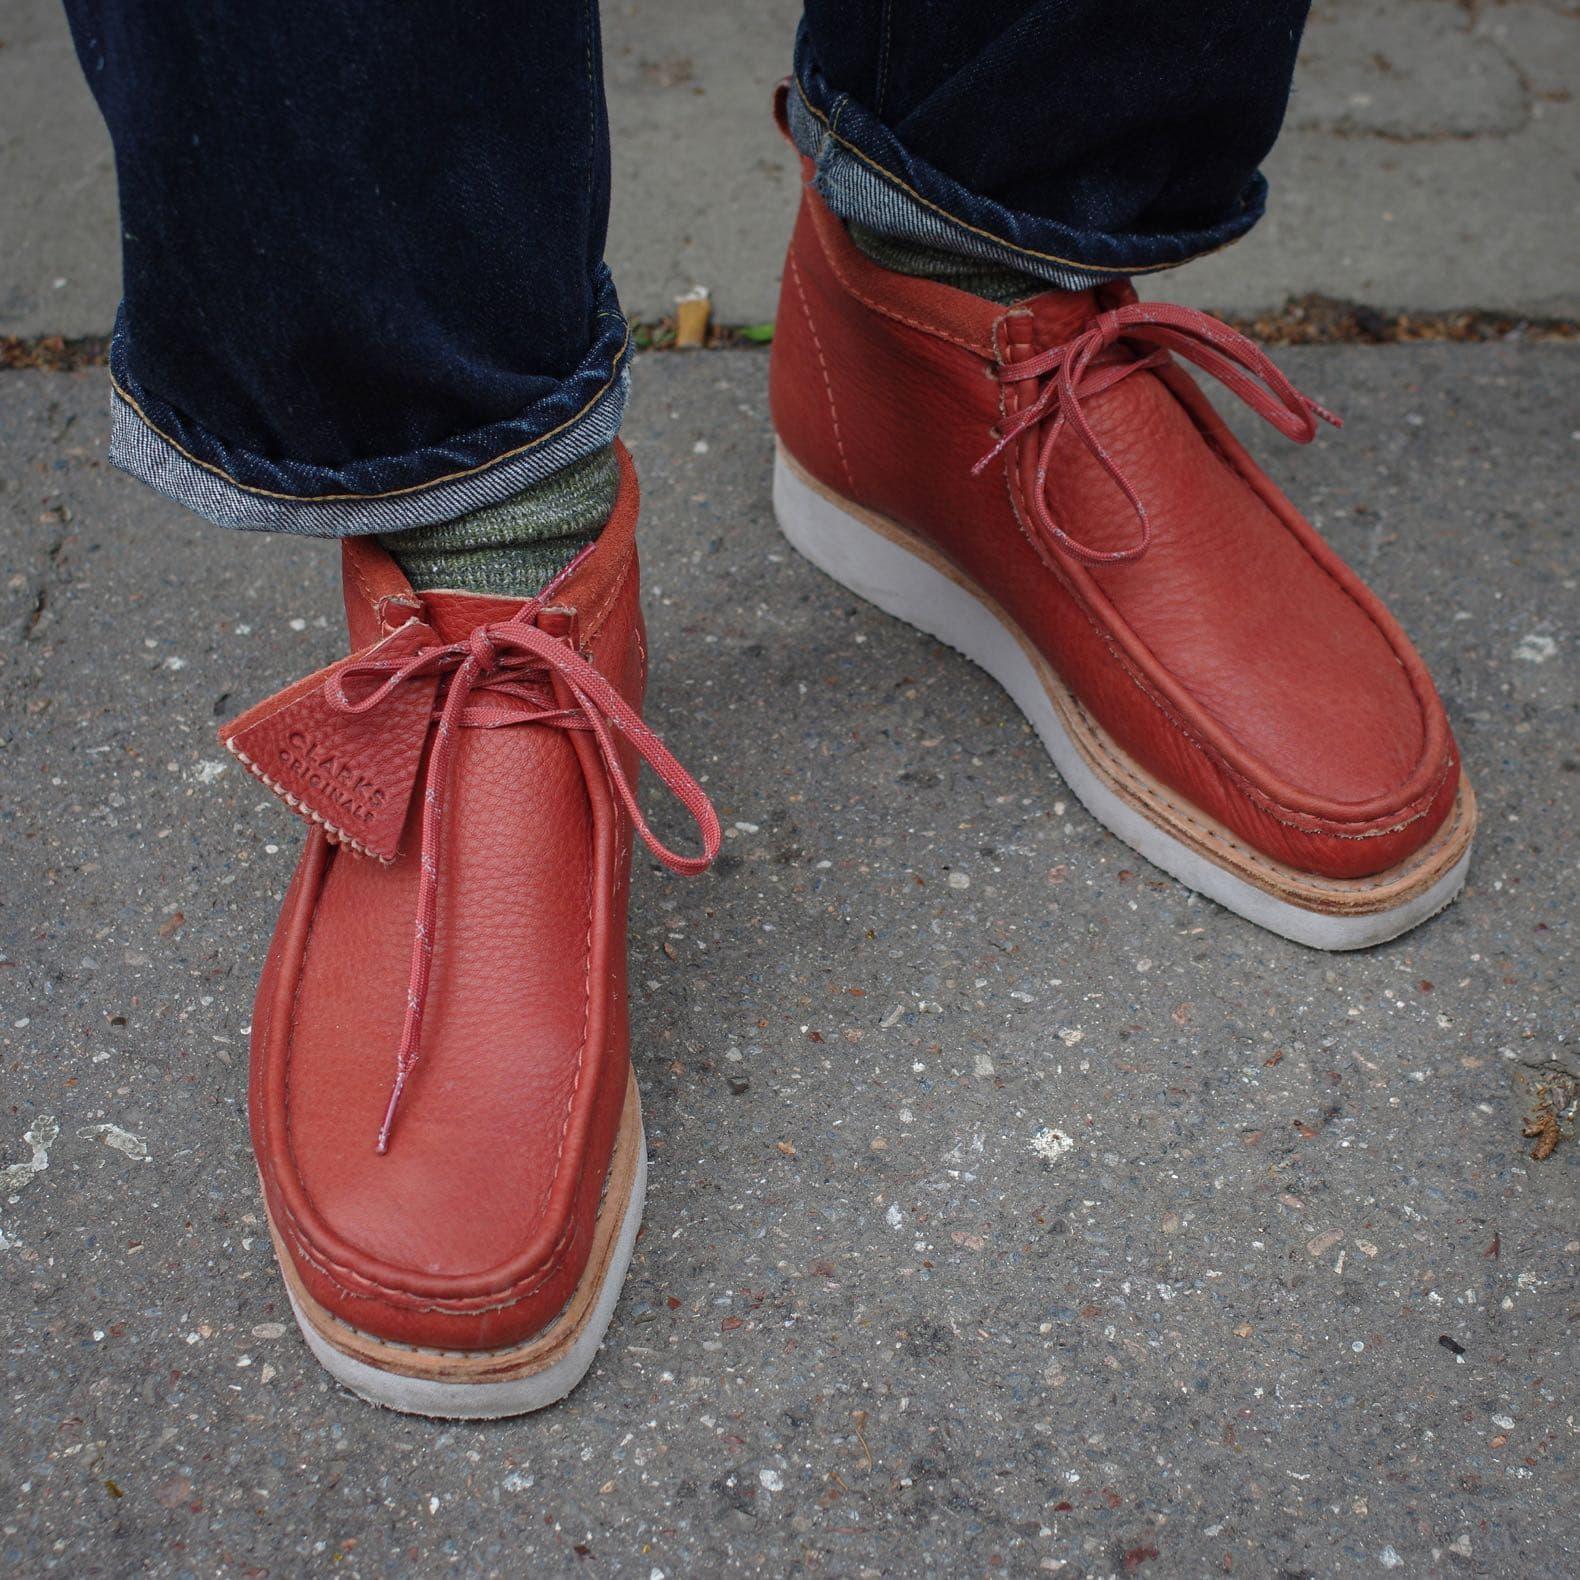 calrks wallabee model hike boots en burnt orange